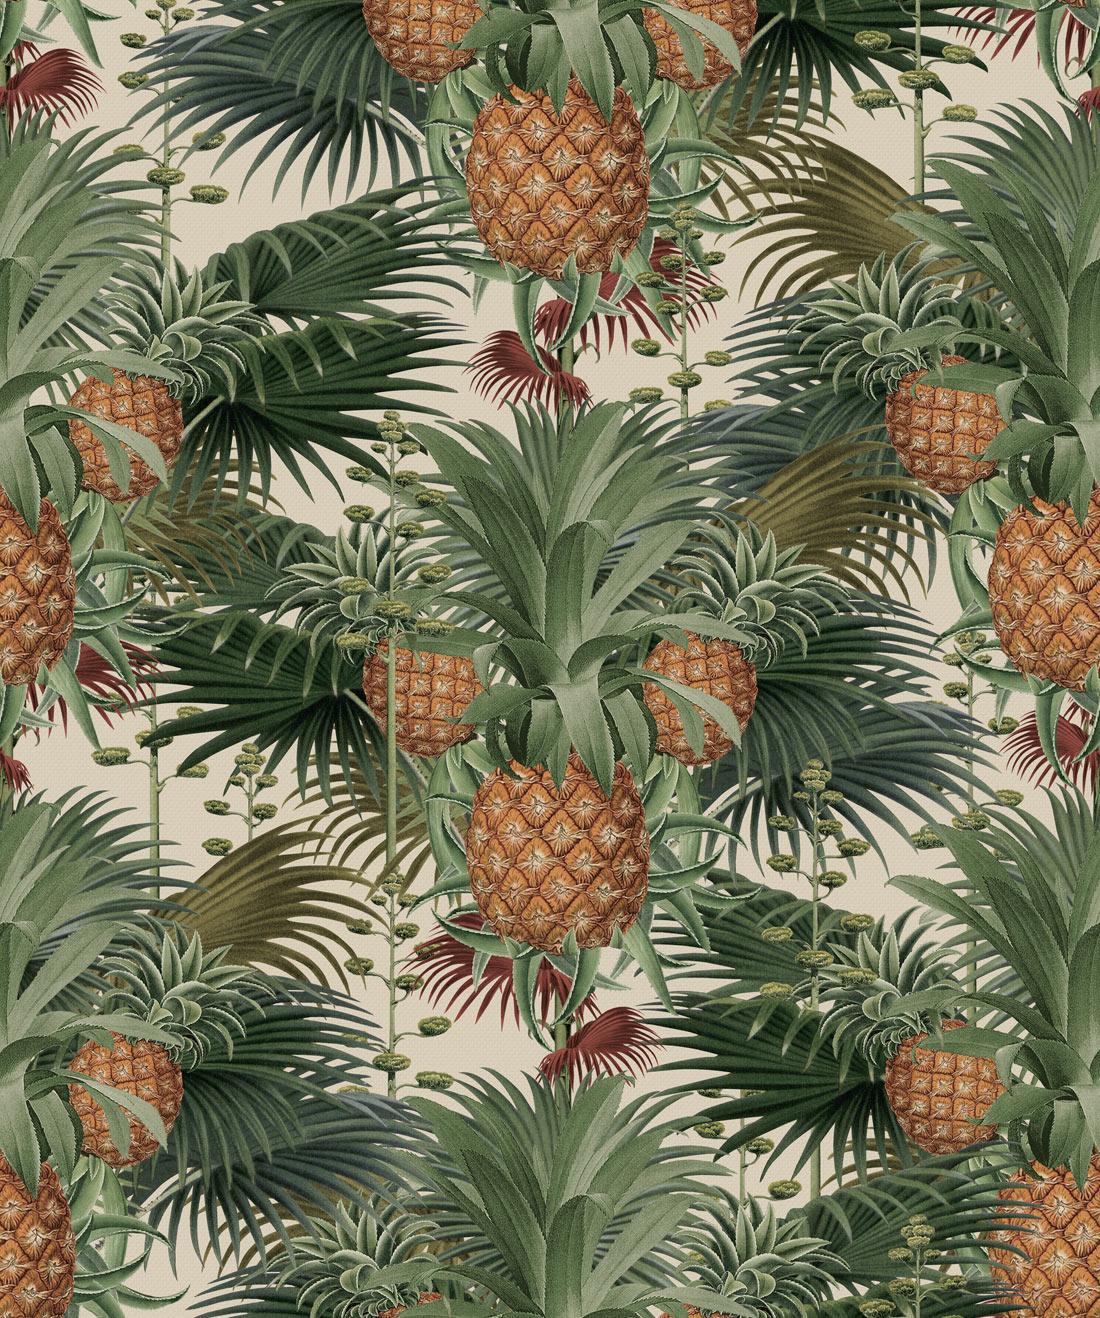 Pineapple Harvest Day